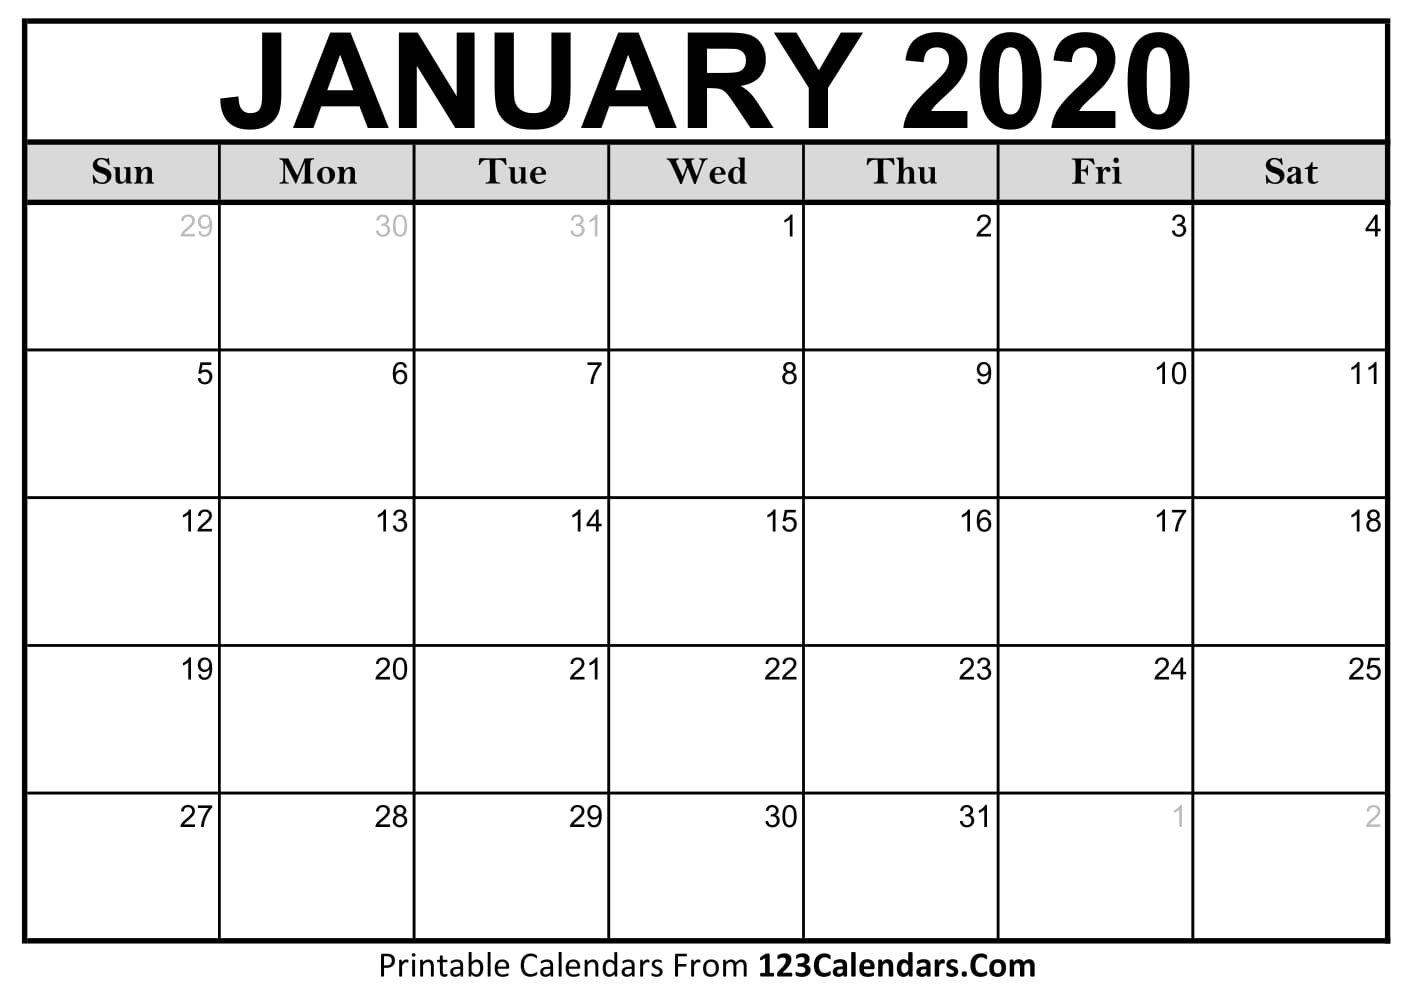 January 2020 Printable Calendar | 123Calendars January 2019 Calendar 123Calendars